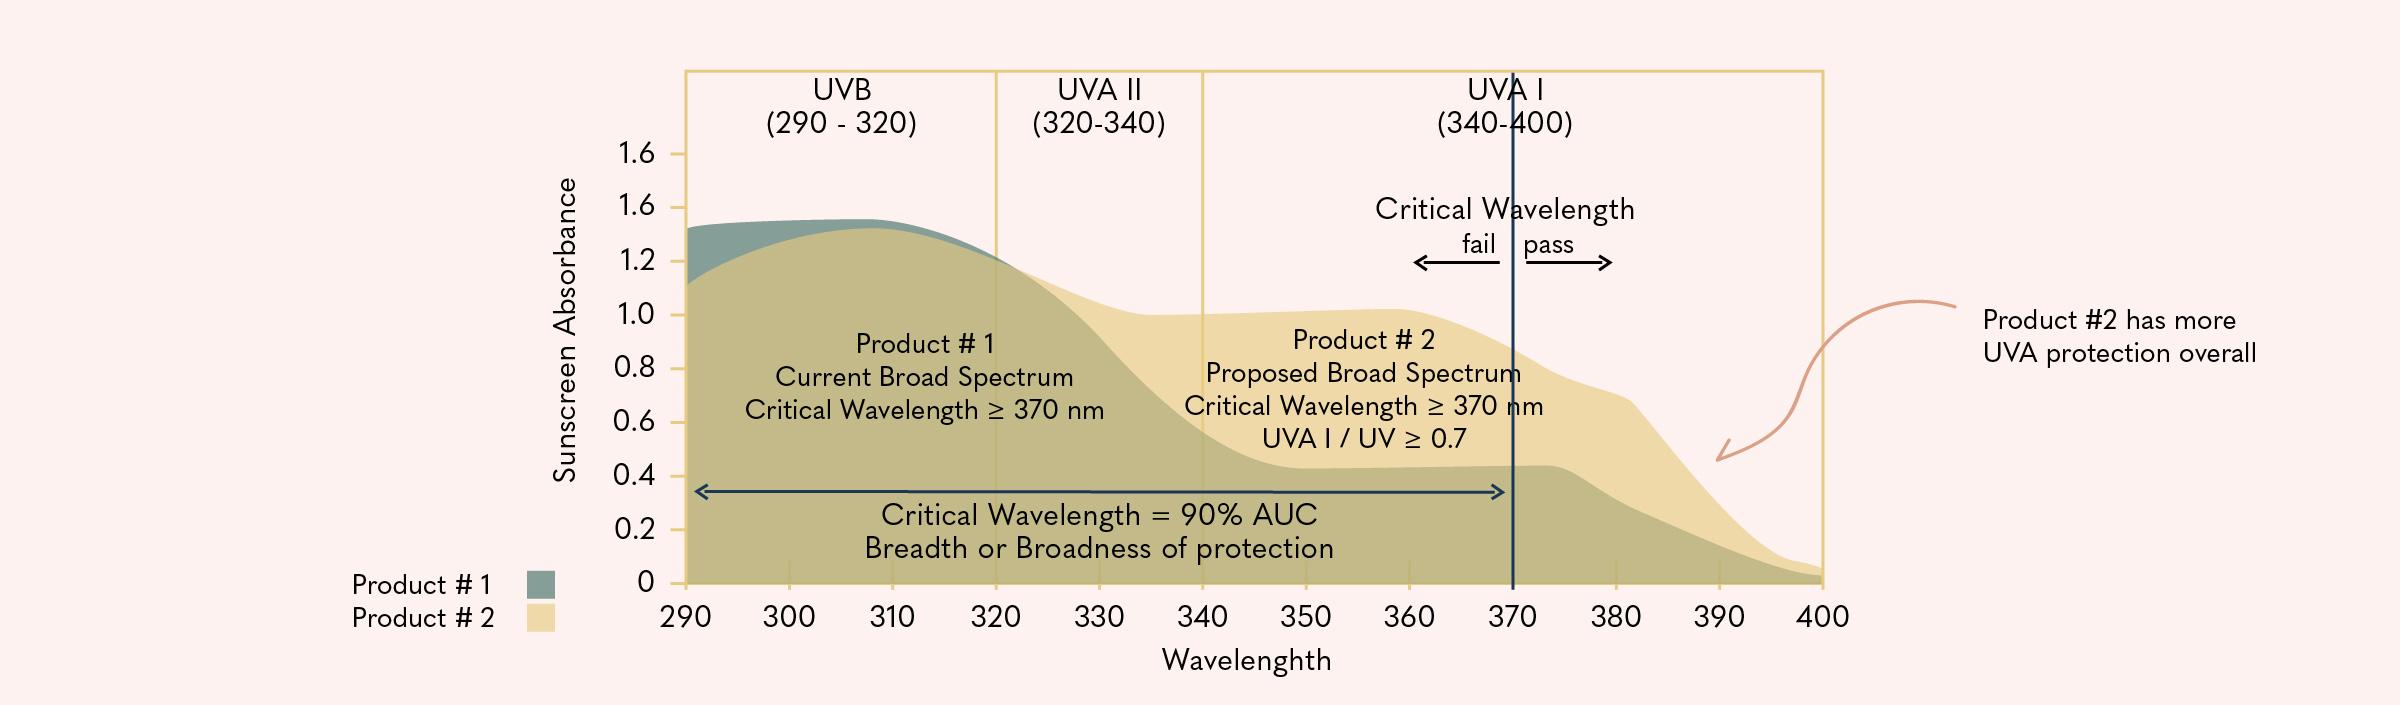 New+Broad+Spectrum+Regulation.jpg